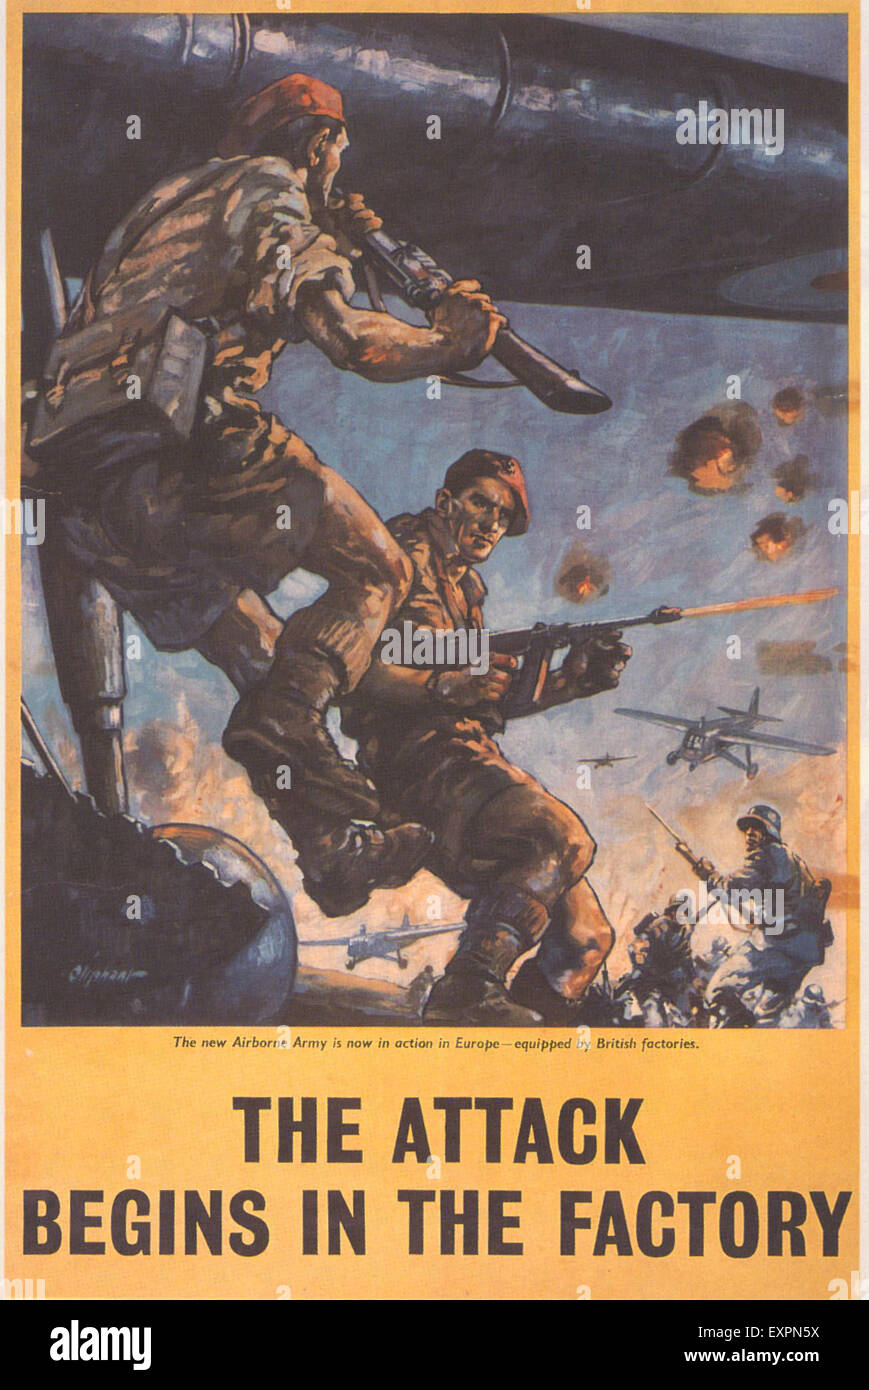 1940s UK WW2 Propaganda Poster - Stock Image